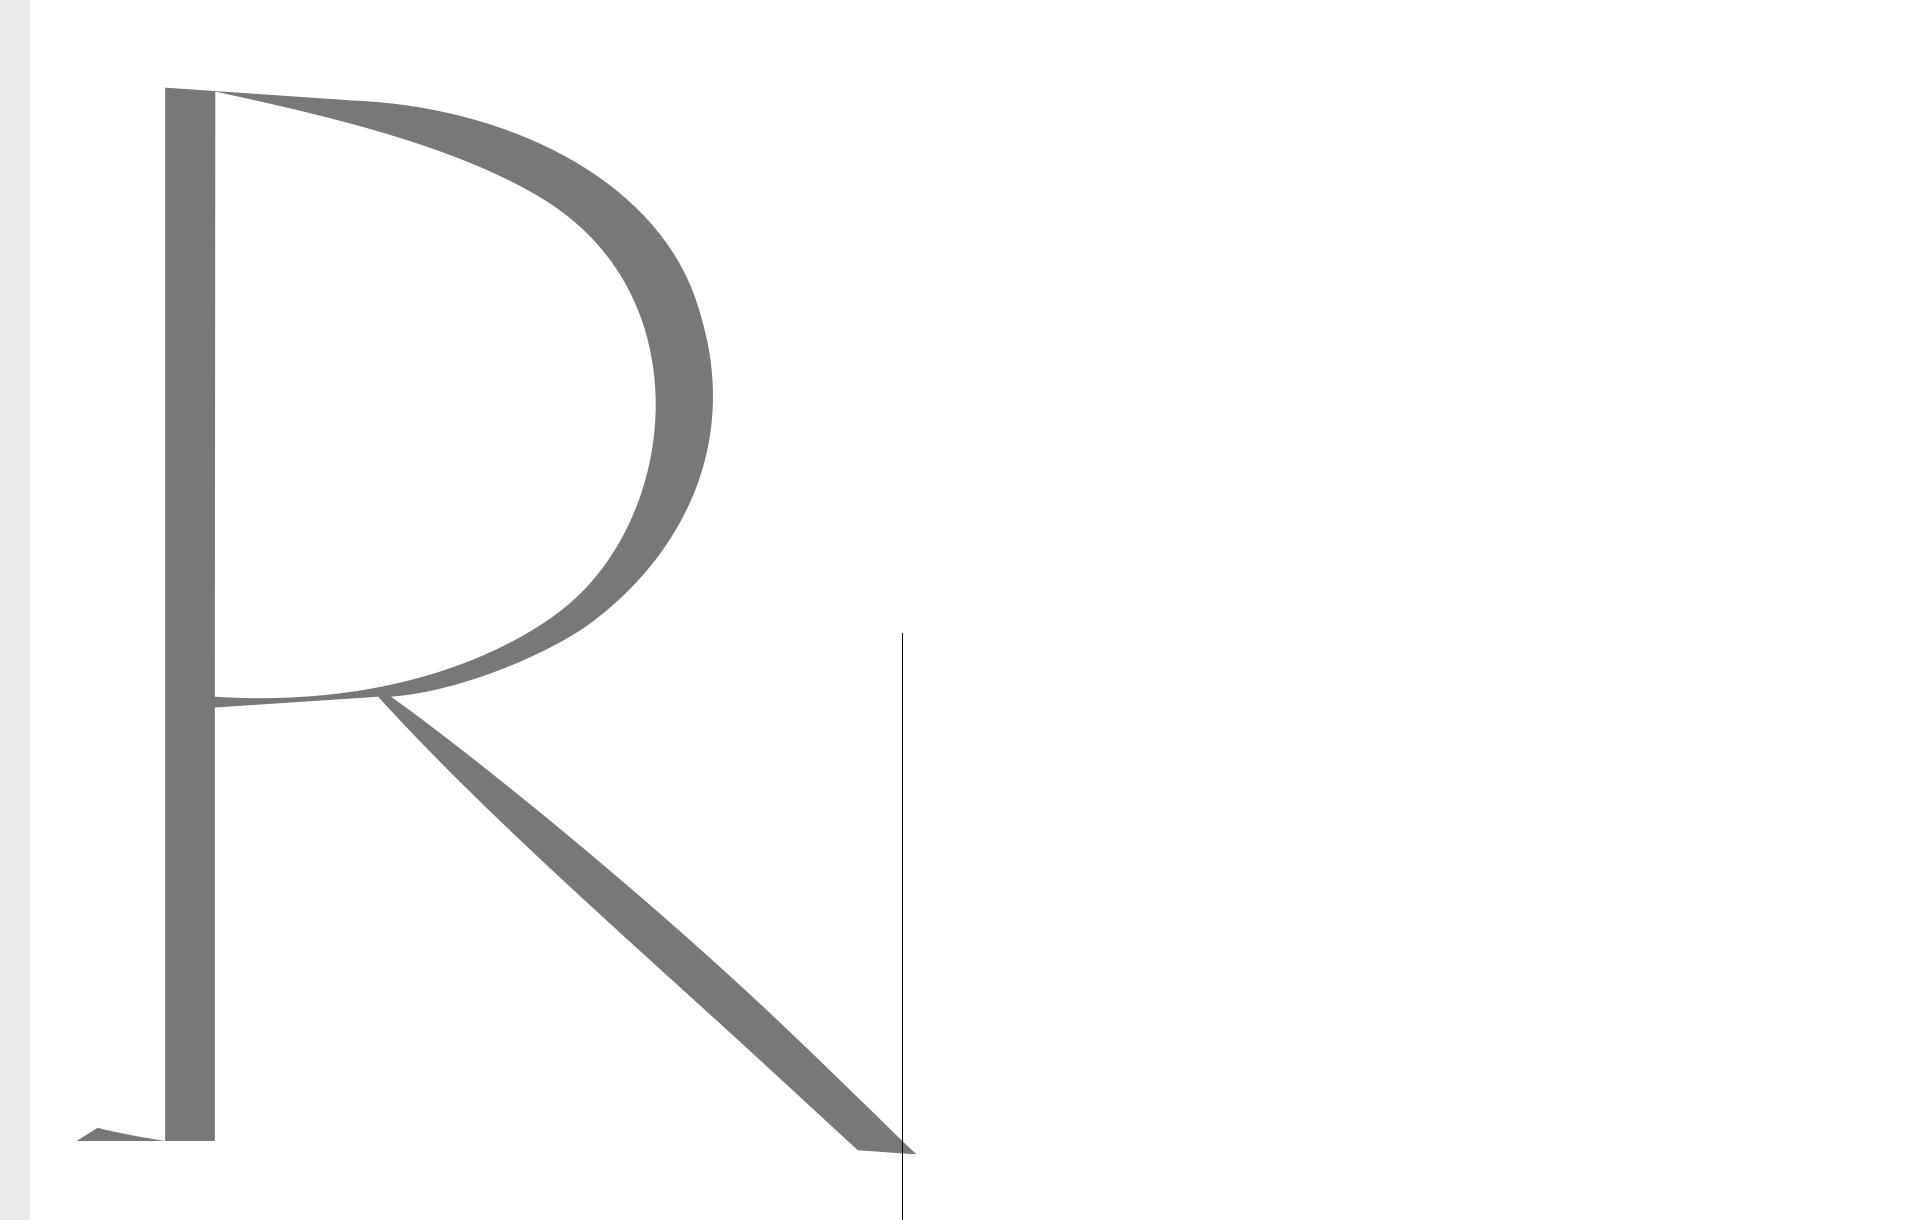 'R' Reflection Ecriture